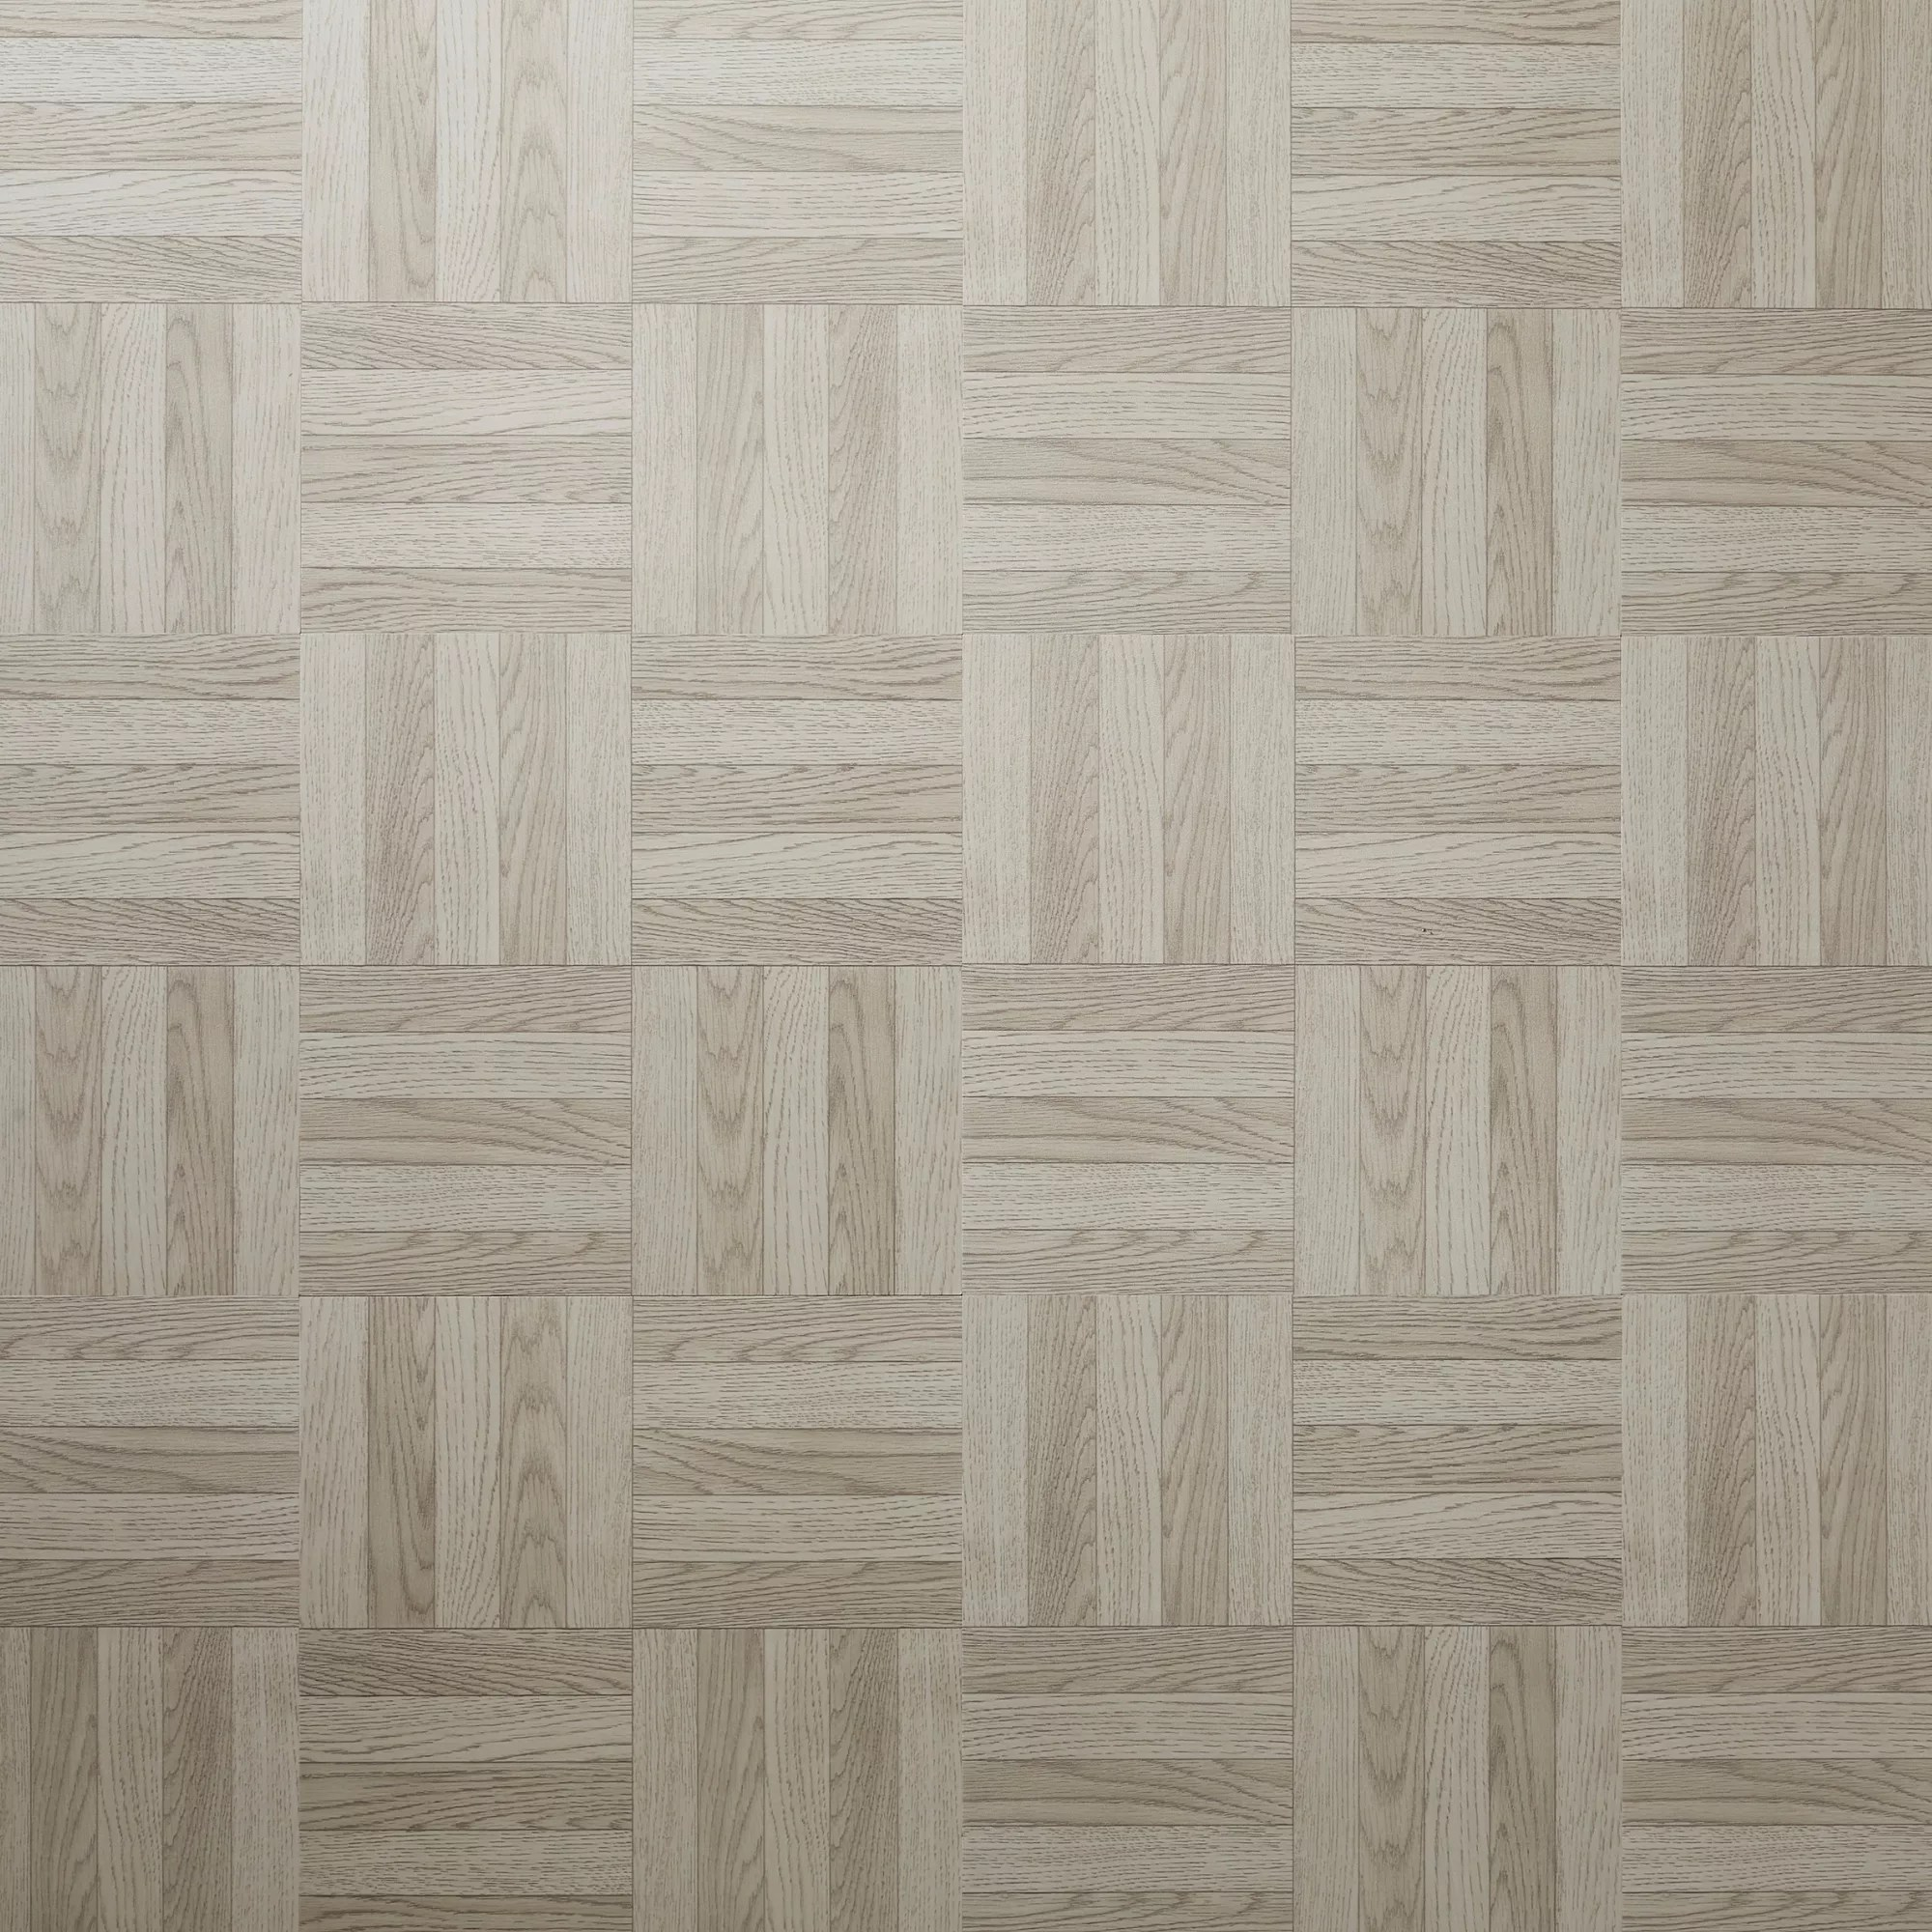 goodhome grey parquet parquet effect self adhesive vinyl tile pack of 13